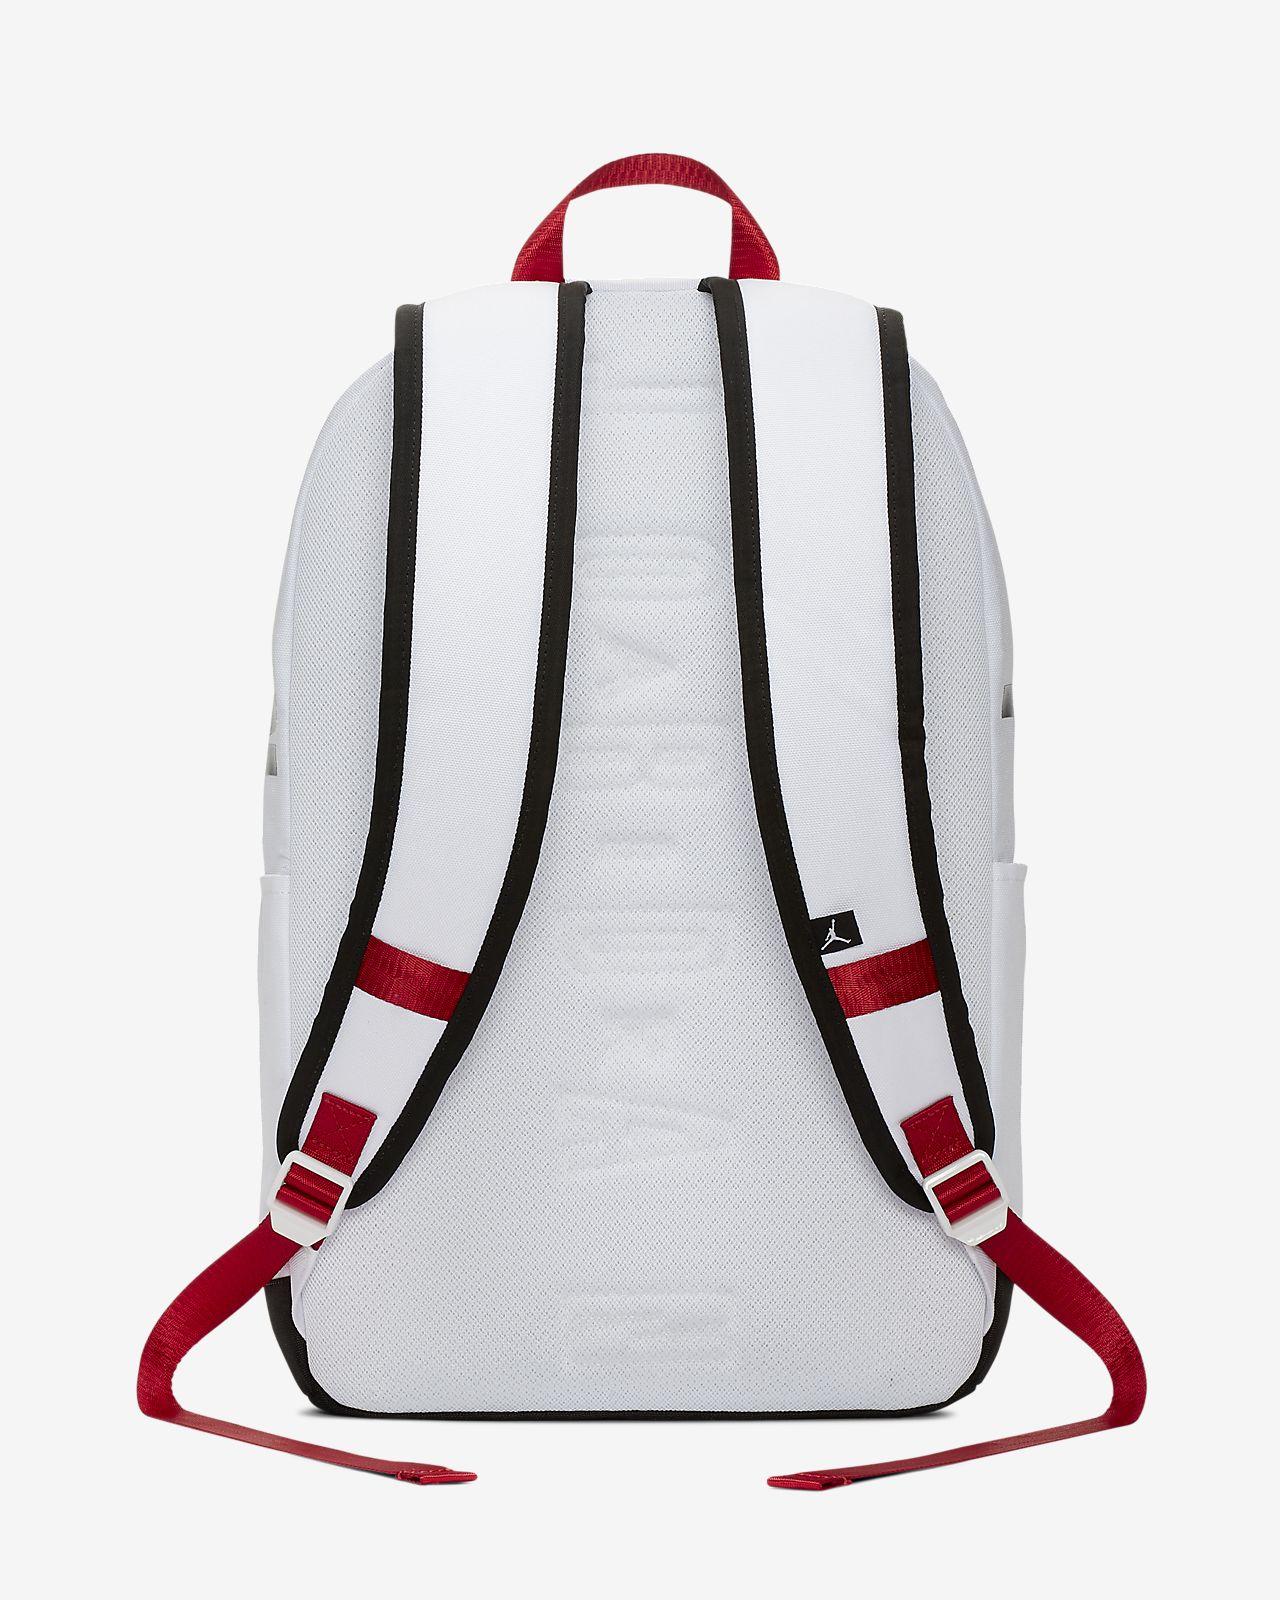 ed8cc77bc197 Low Resolution Jordan Air Patrol Backpack Jordan Air Patrol Backpack